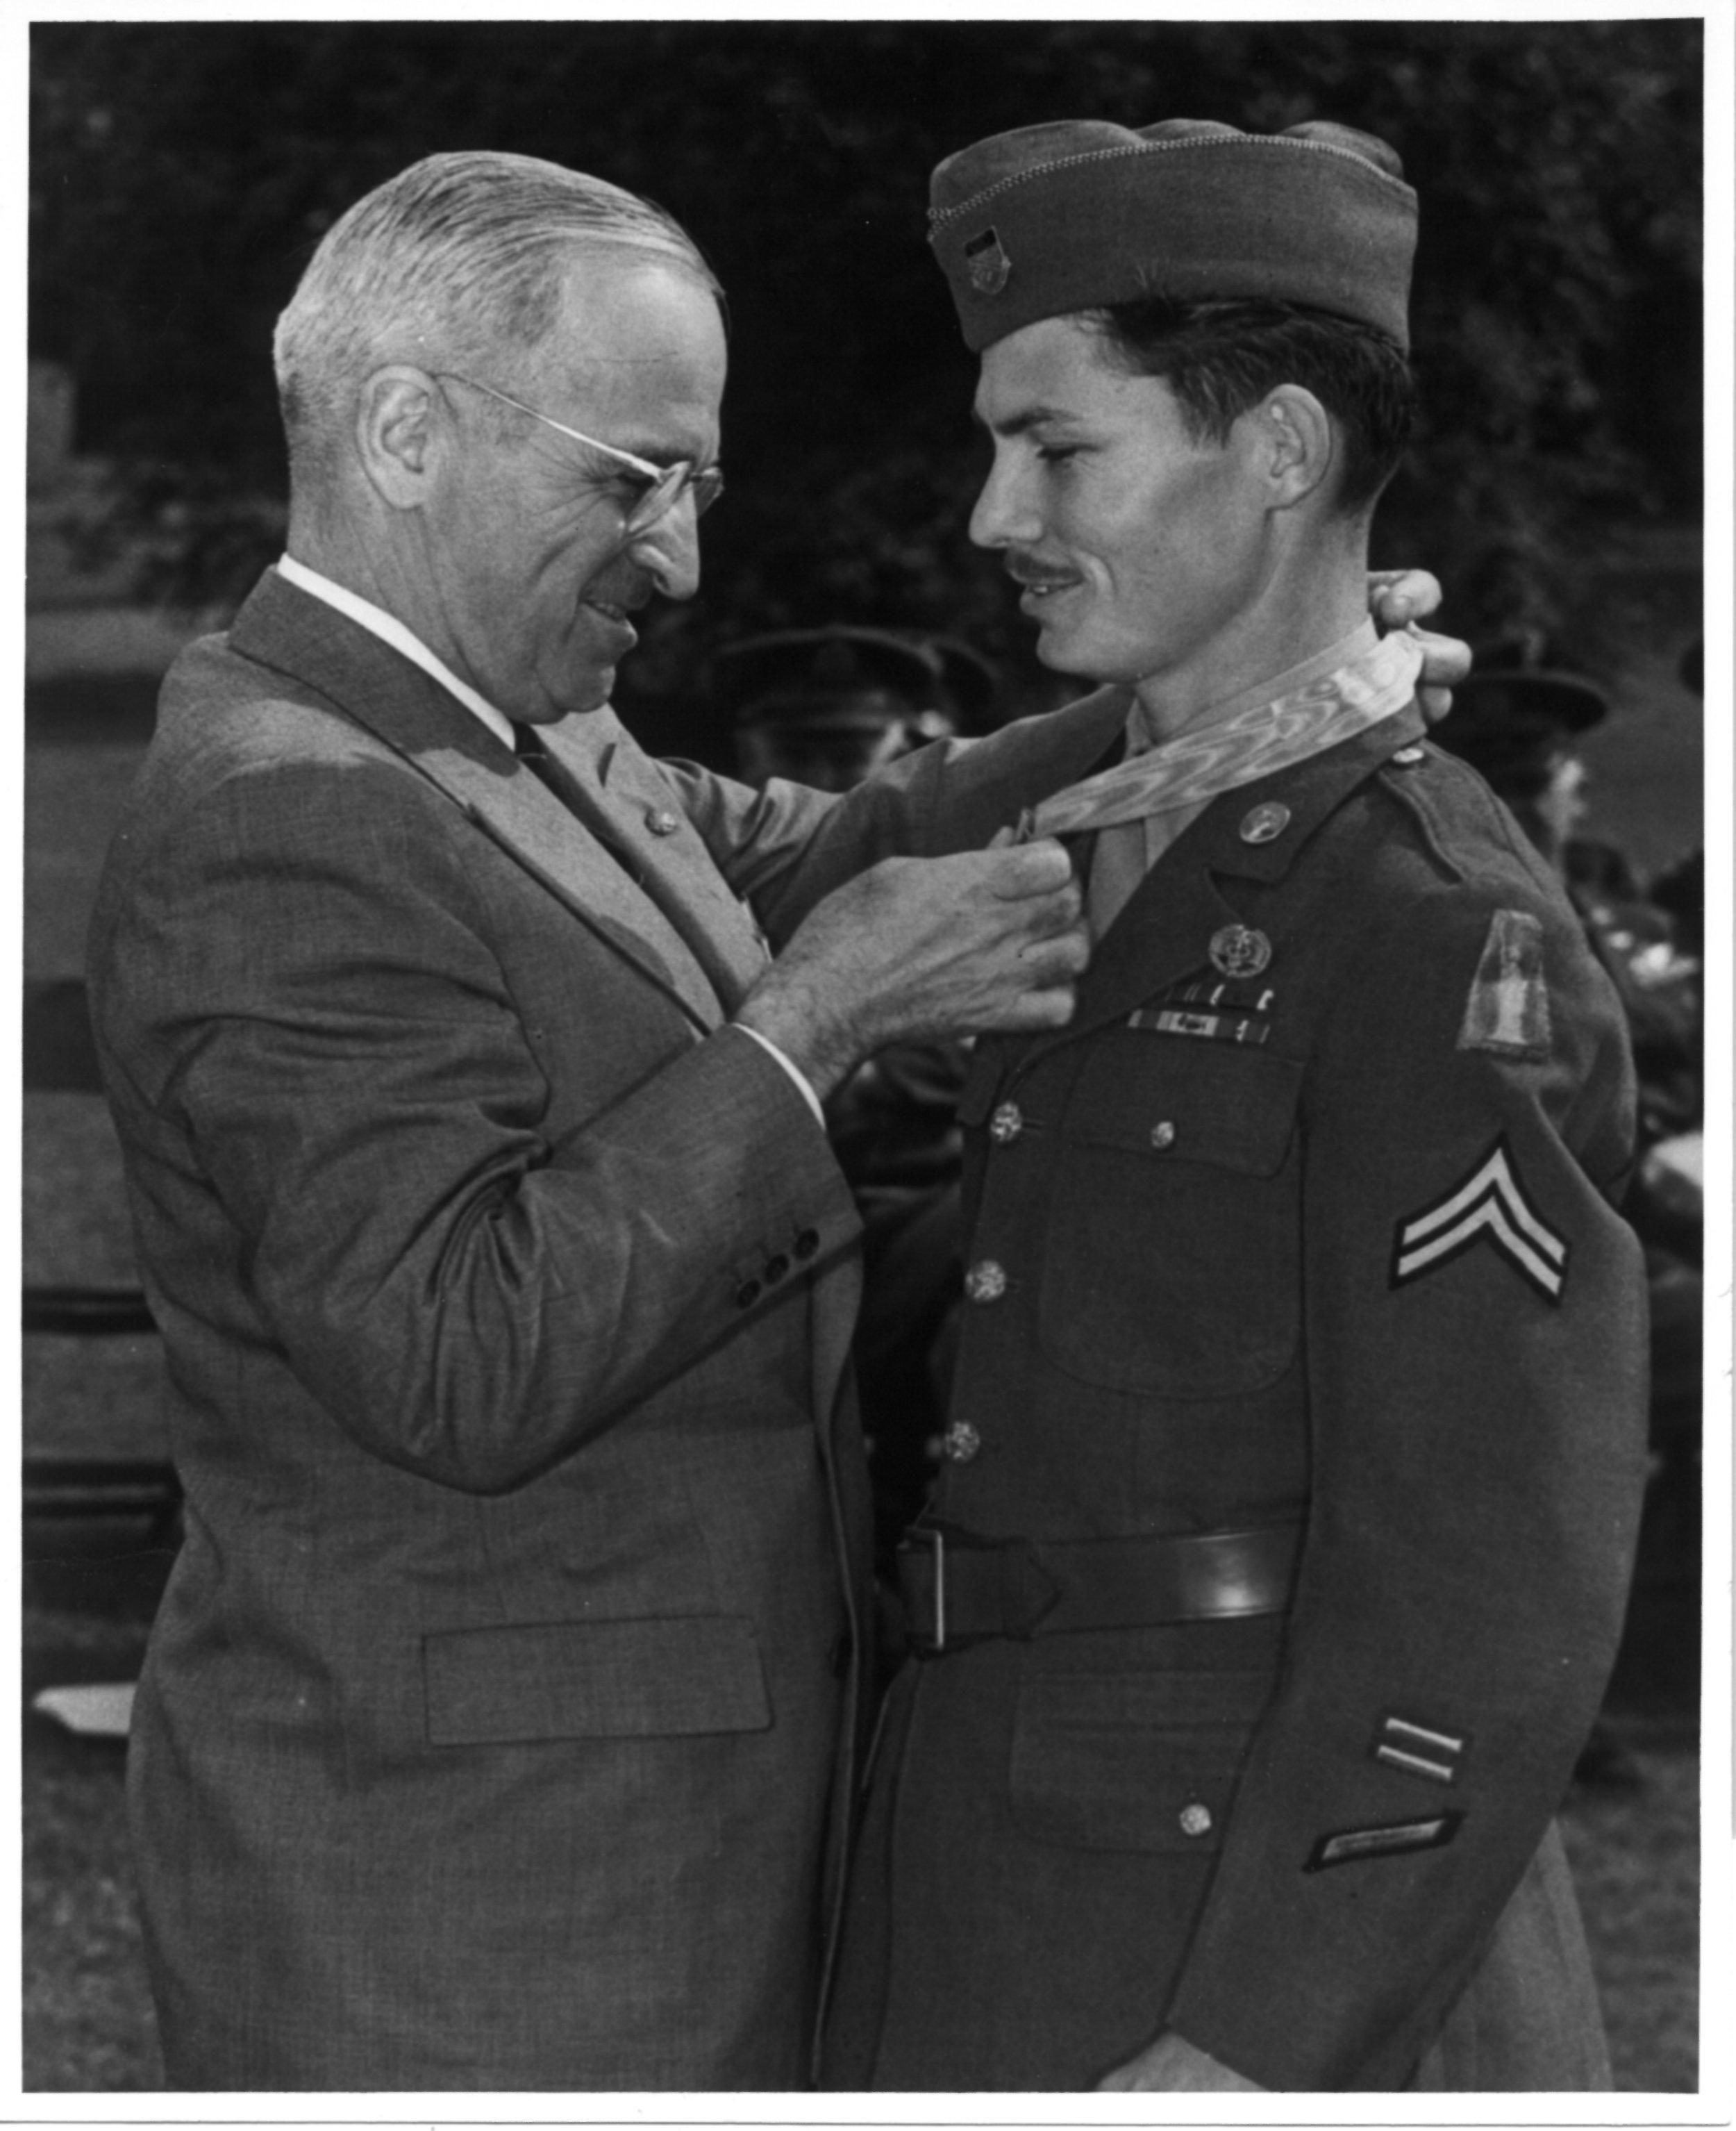 Desmond Doss receives Medal of Honor